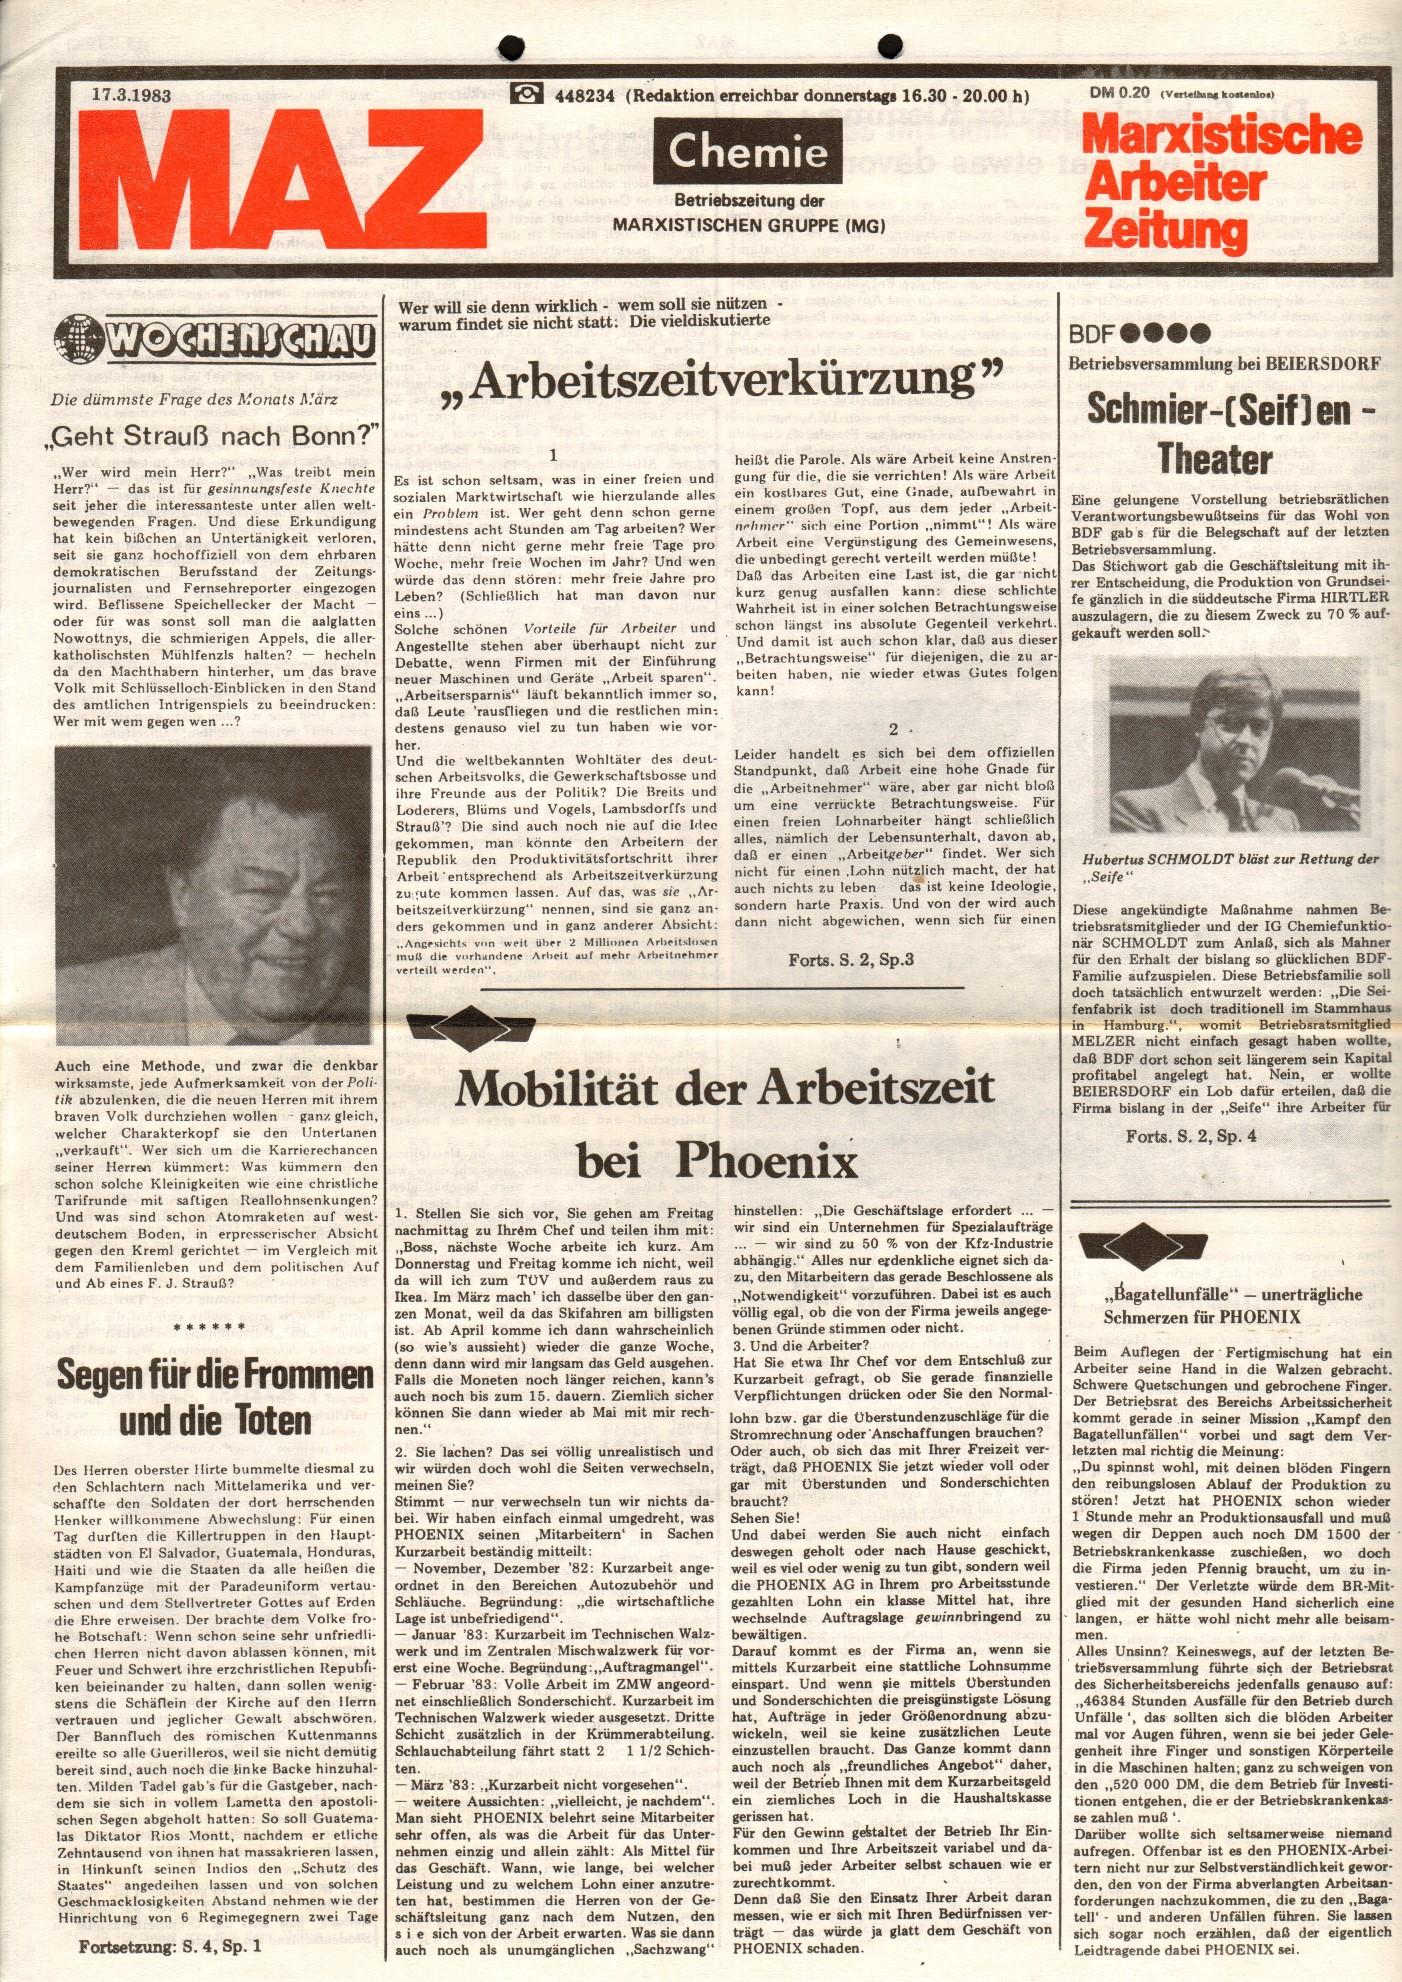 Hamburg_MG_MAZ_Chemie_19830317_01